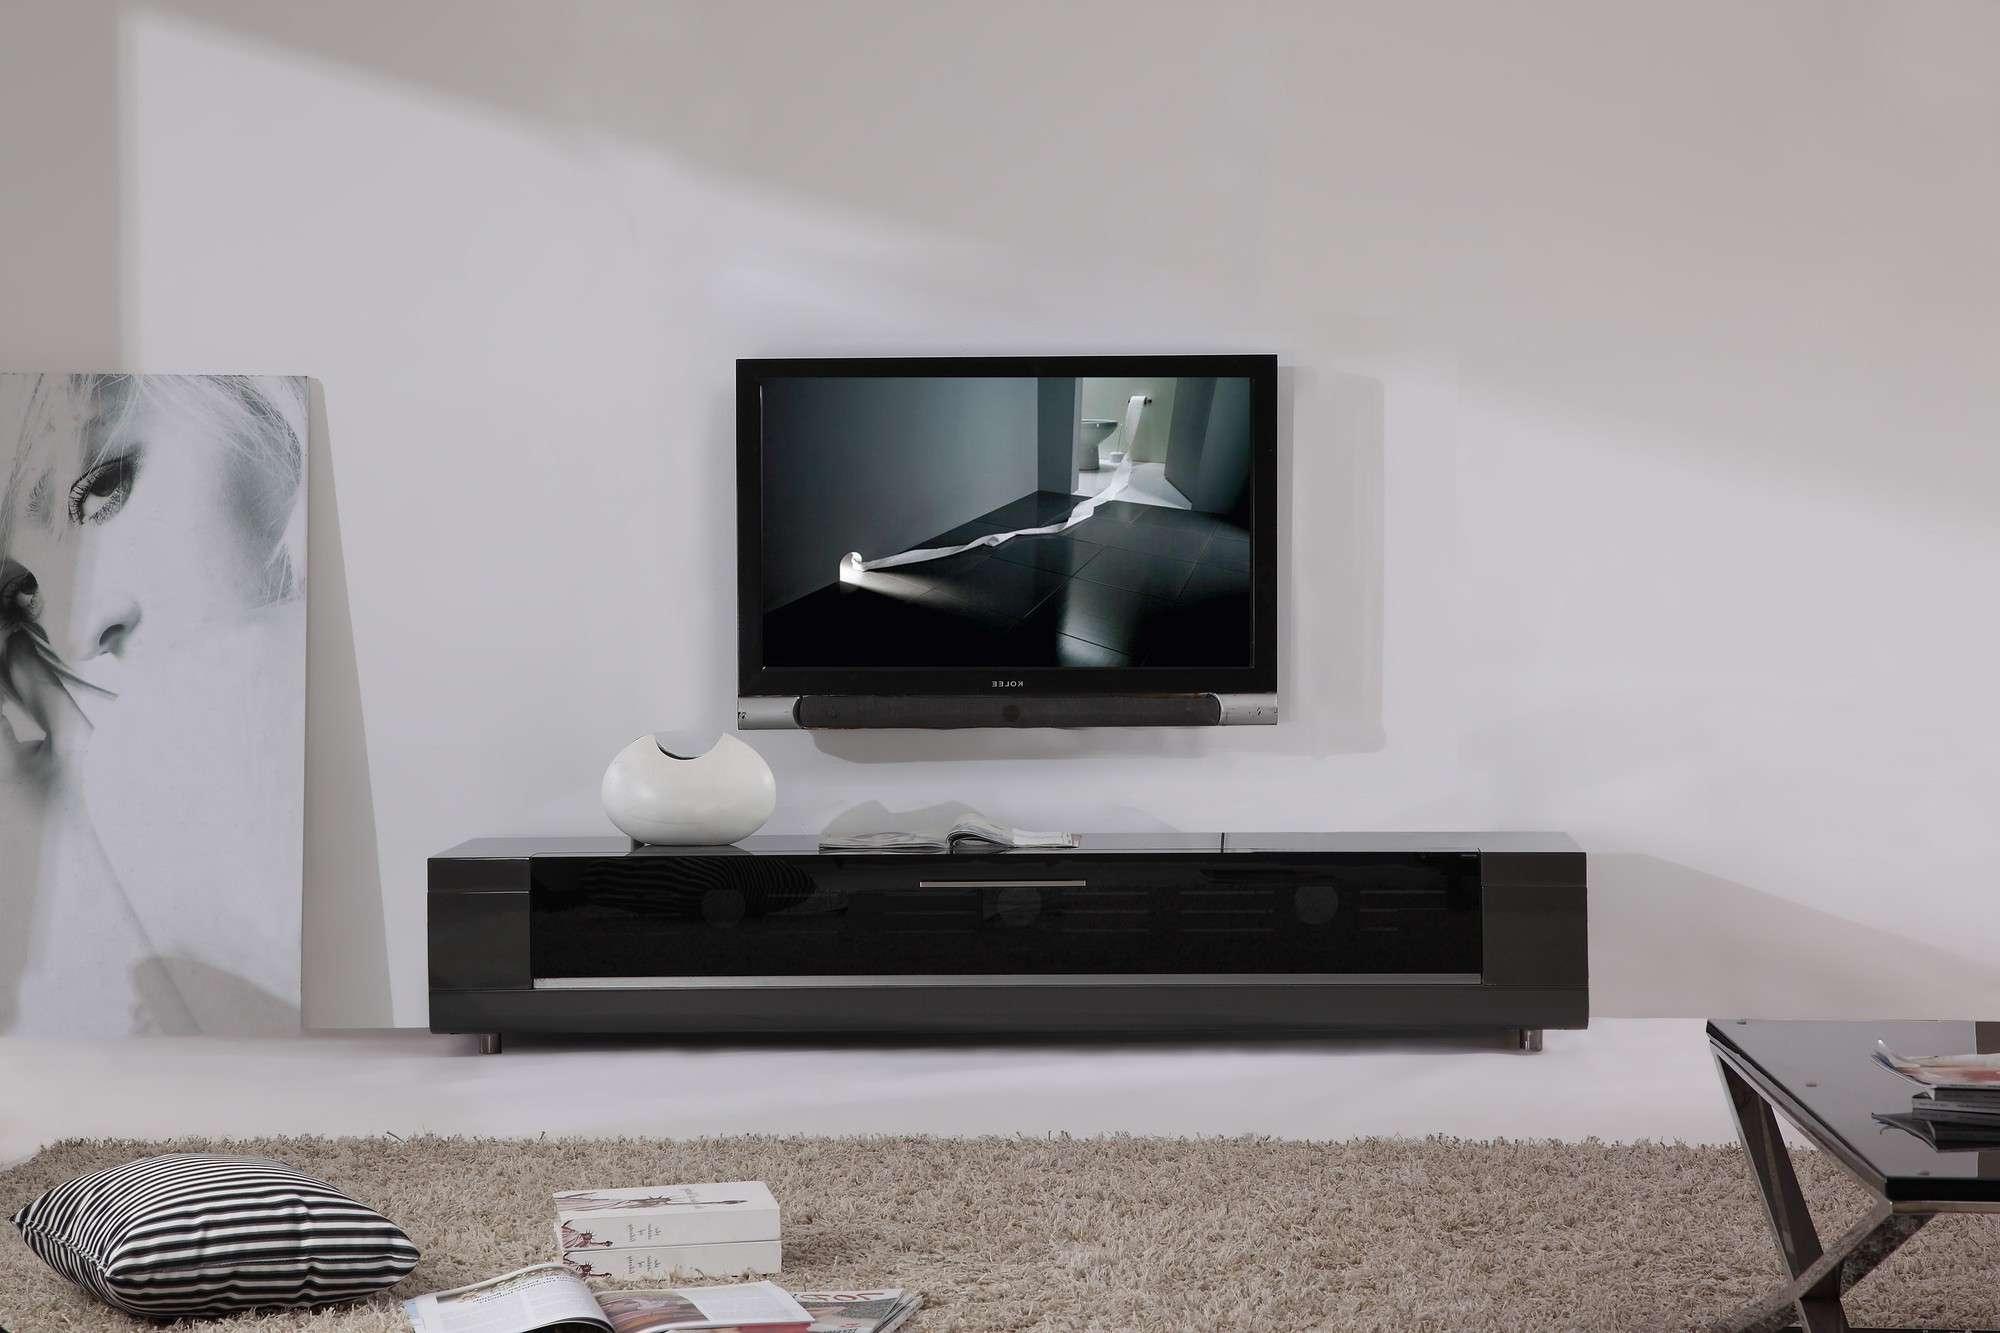 B Modern Editor Remix Tv Stand Modern Furnishings Regarding B Modern Tv Stands (View 11 of 15)